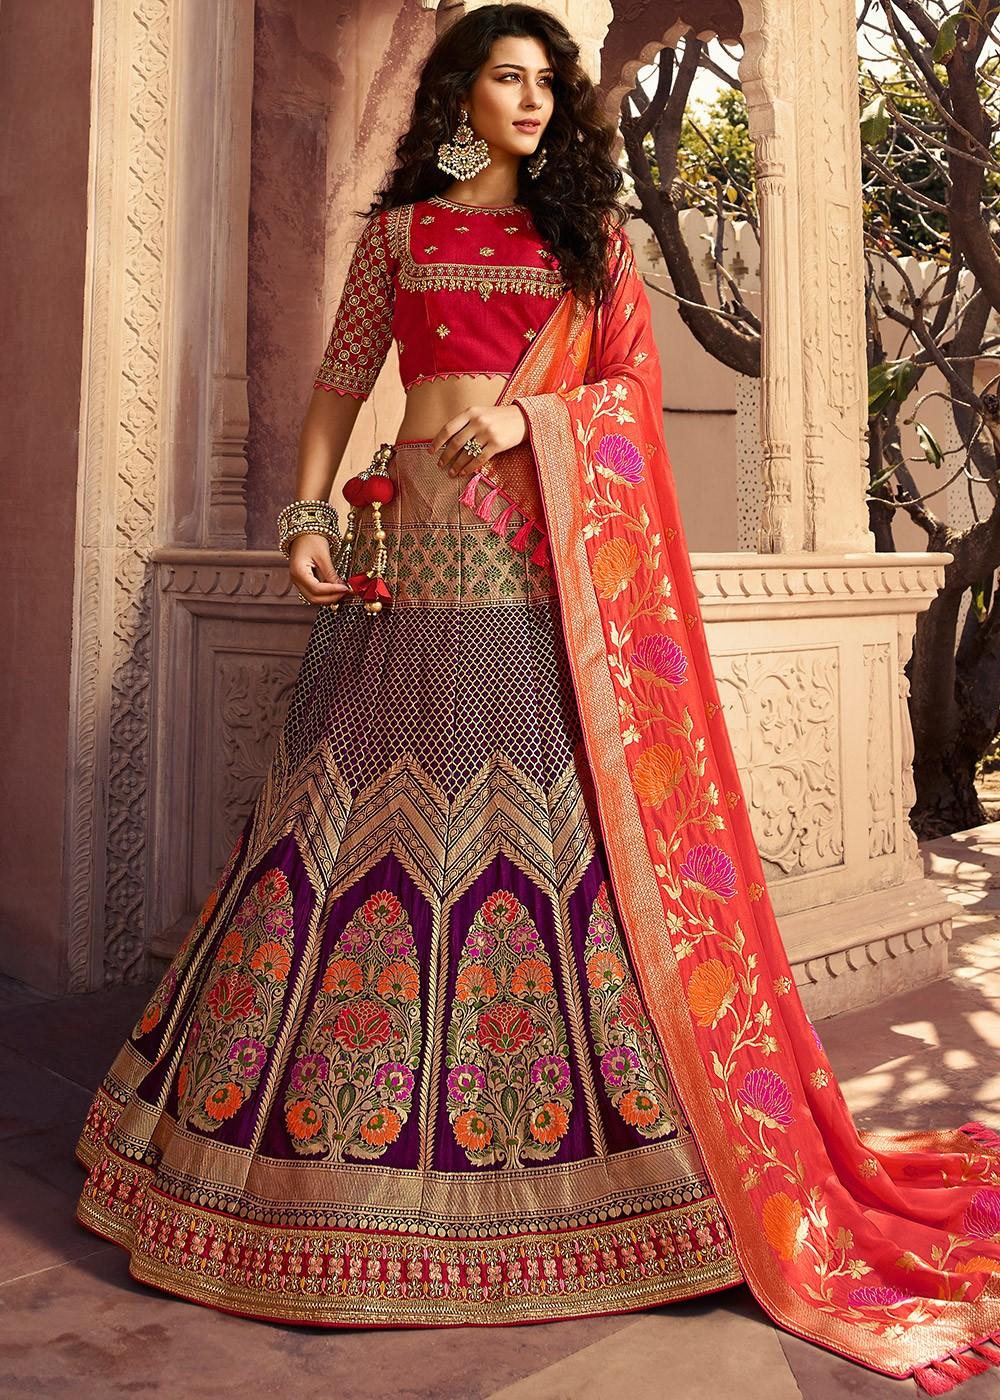 Party Wear Indian Wedding Bridal Lehenga Purple Red 13251,Wedding Royal Blue And Gold Bridesmaid Dresses